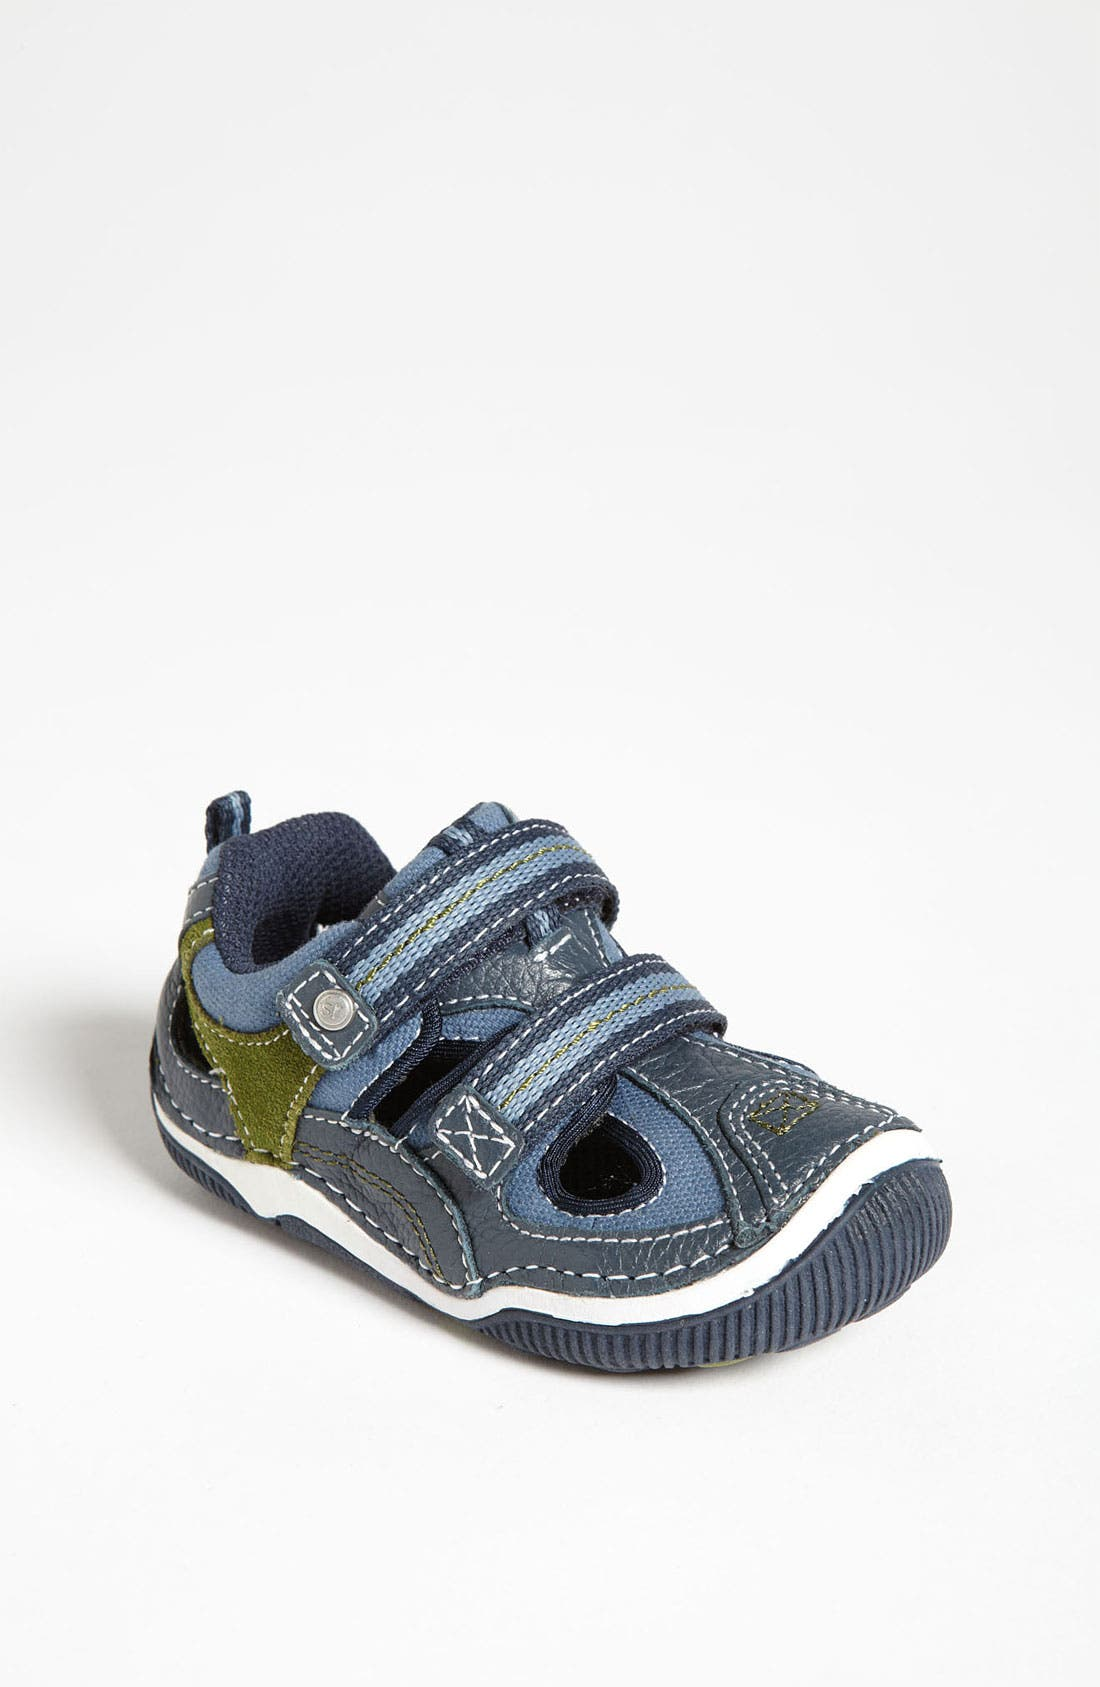 Alternate Image 1 Selected - Stride Rite 'Ruben' Sandal (Baby, Walker & Toddler)